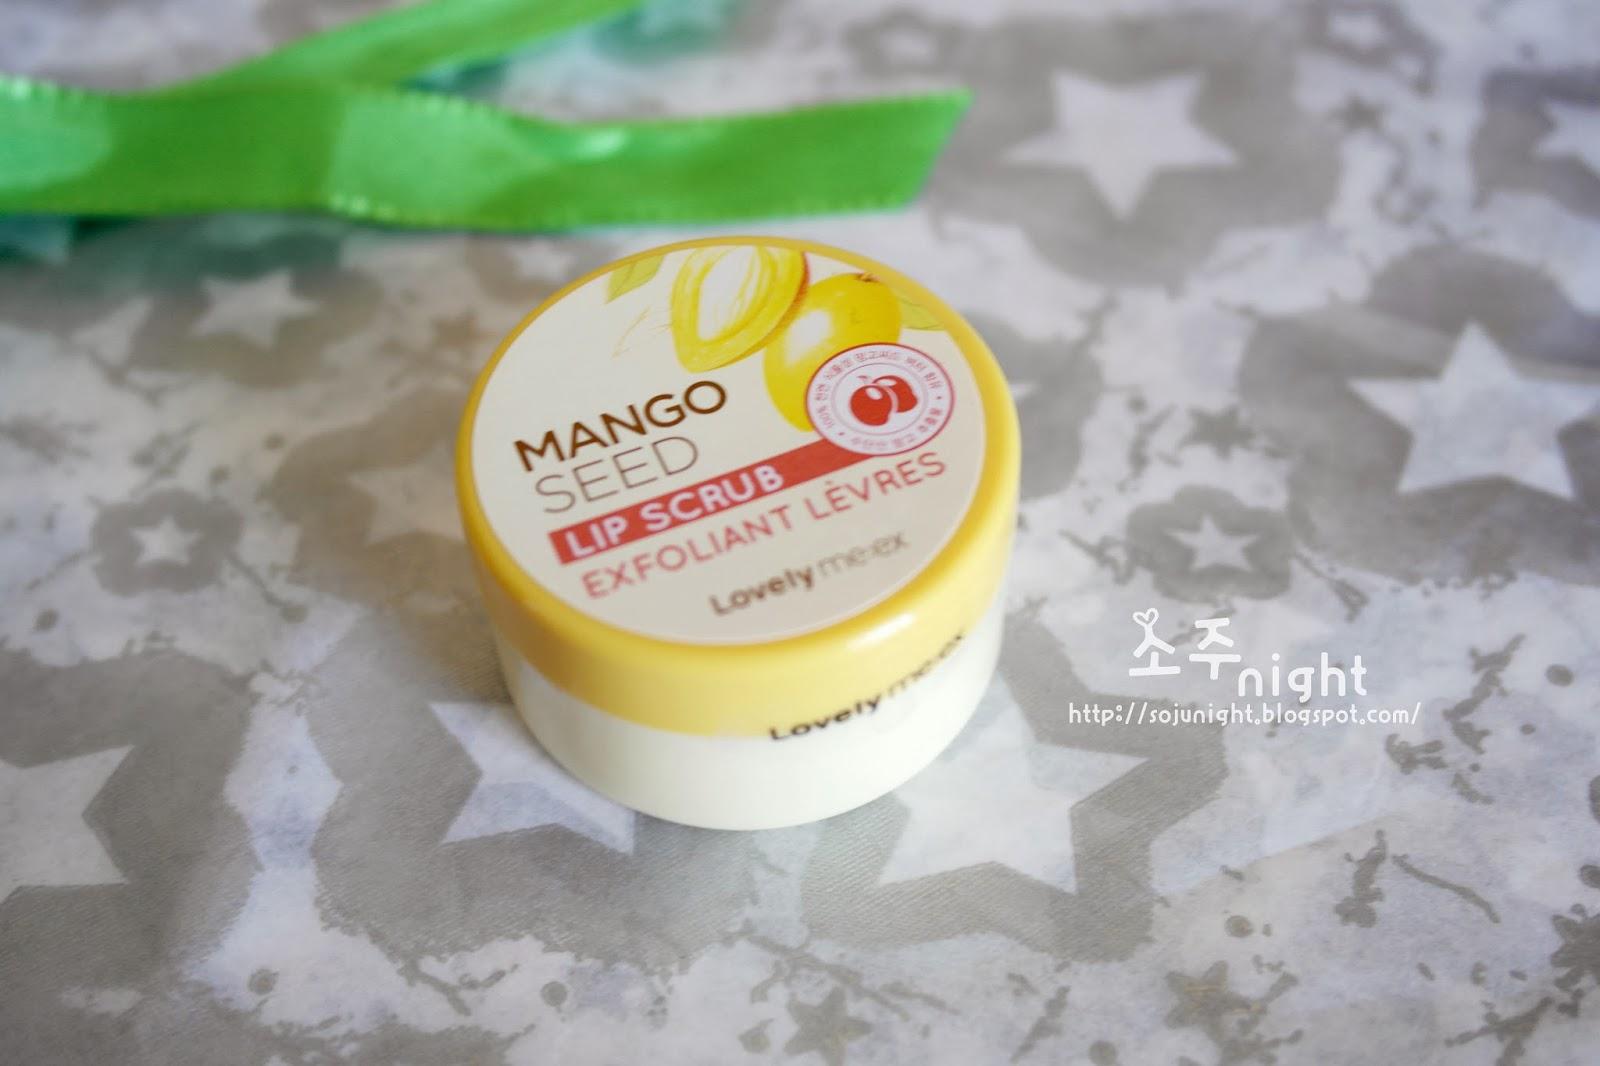 Tẩy da chết môi The Face Shop Mango Seed Lip Scrub